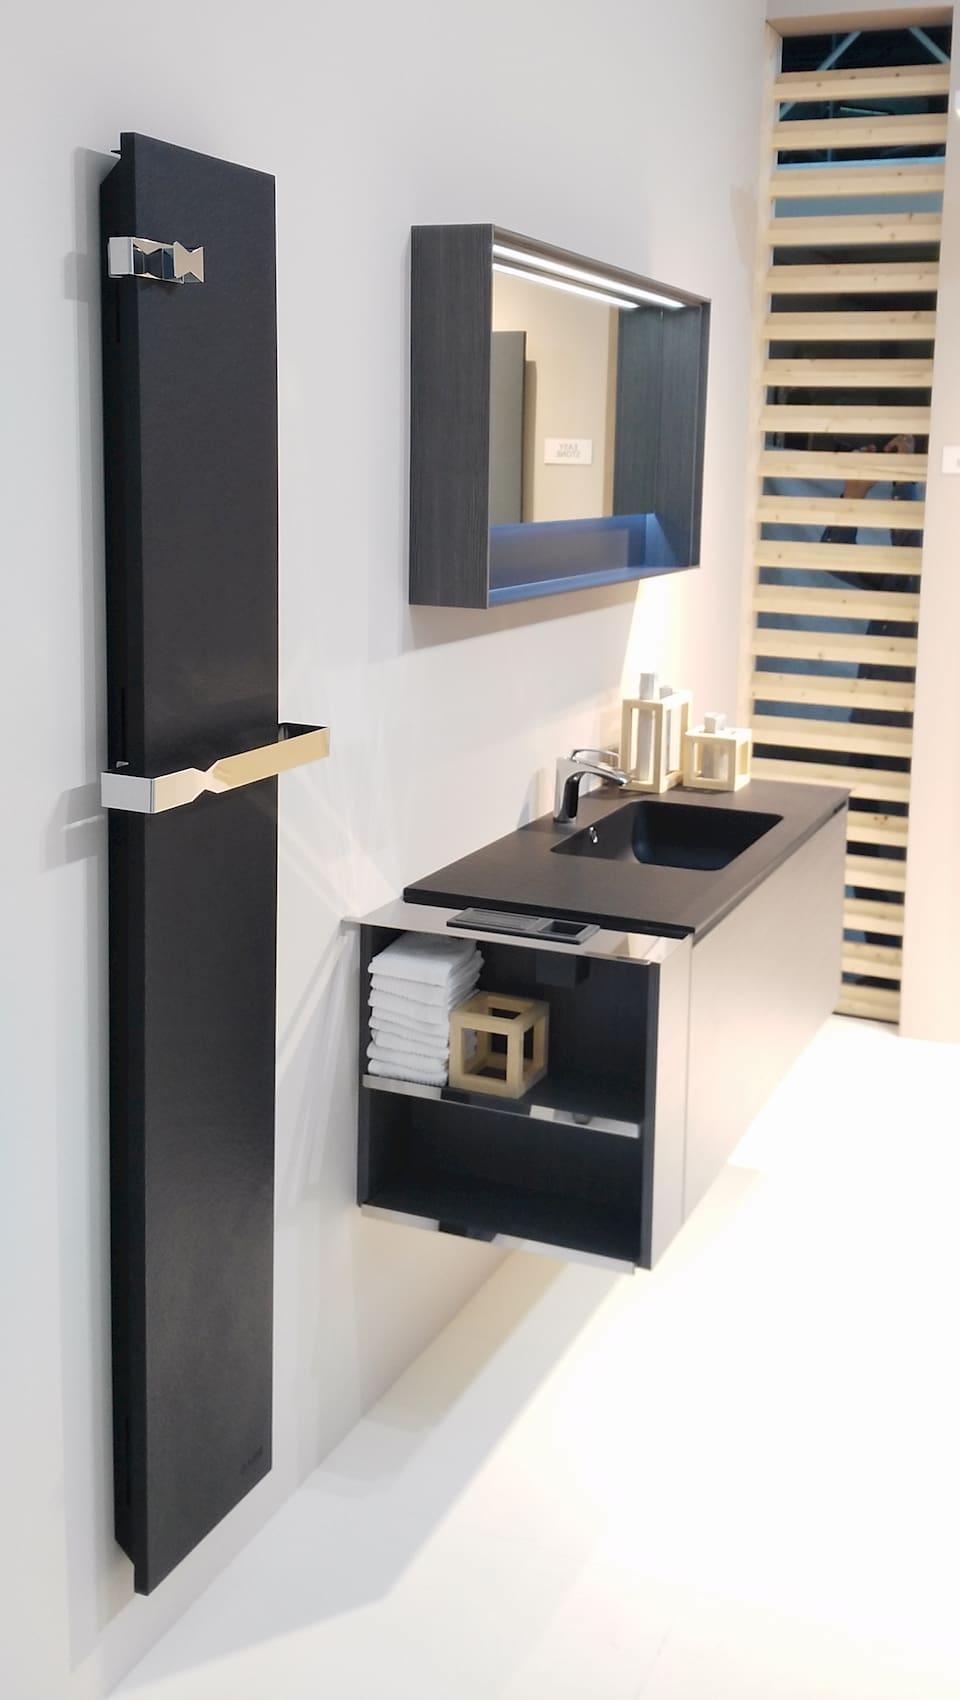 Creative Radiators decorative radiators install in a bathroom